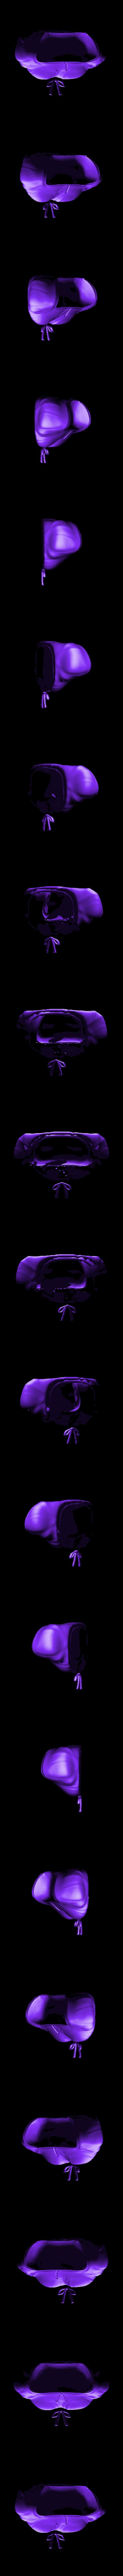 body.stl Download free STL file sagesumi remix • 3D printable model, CyberCyclist